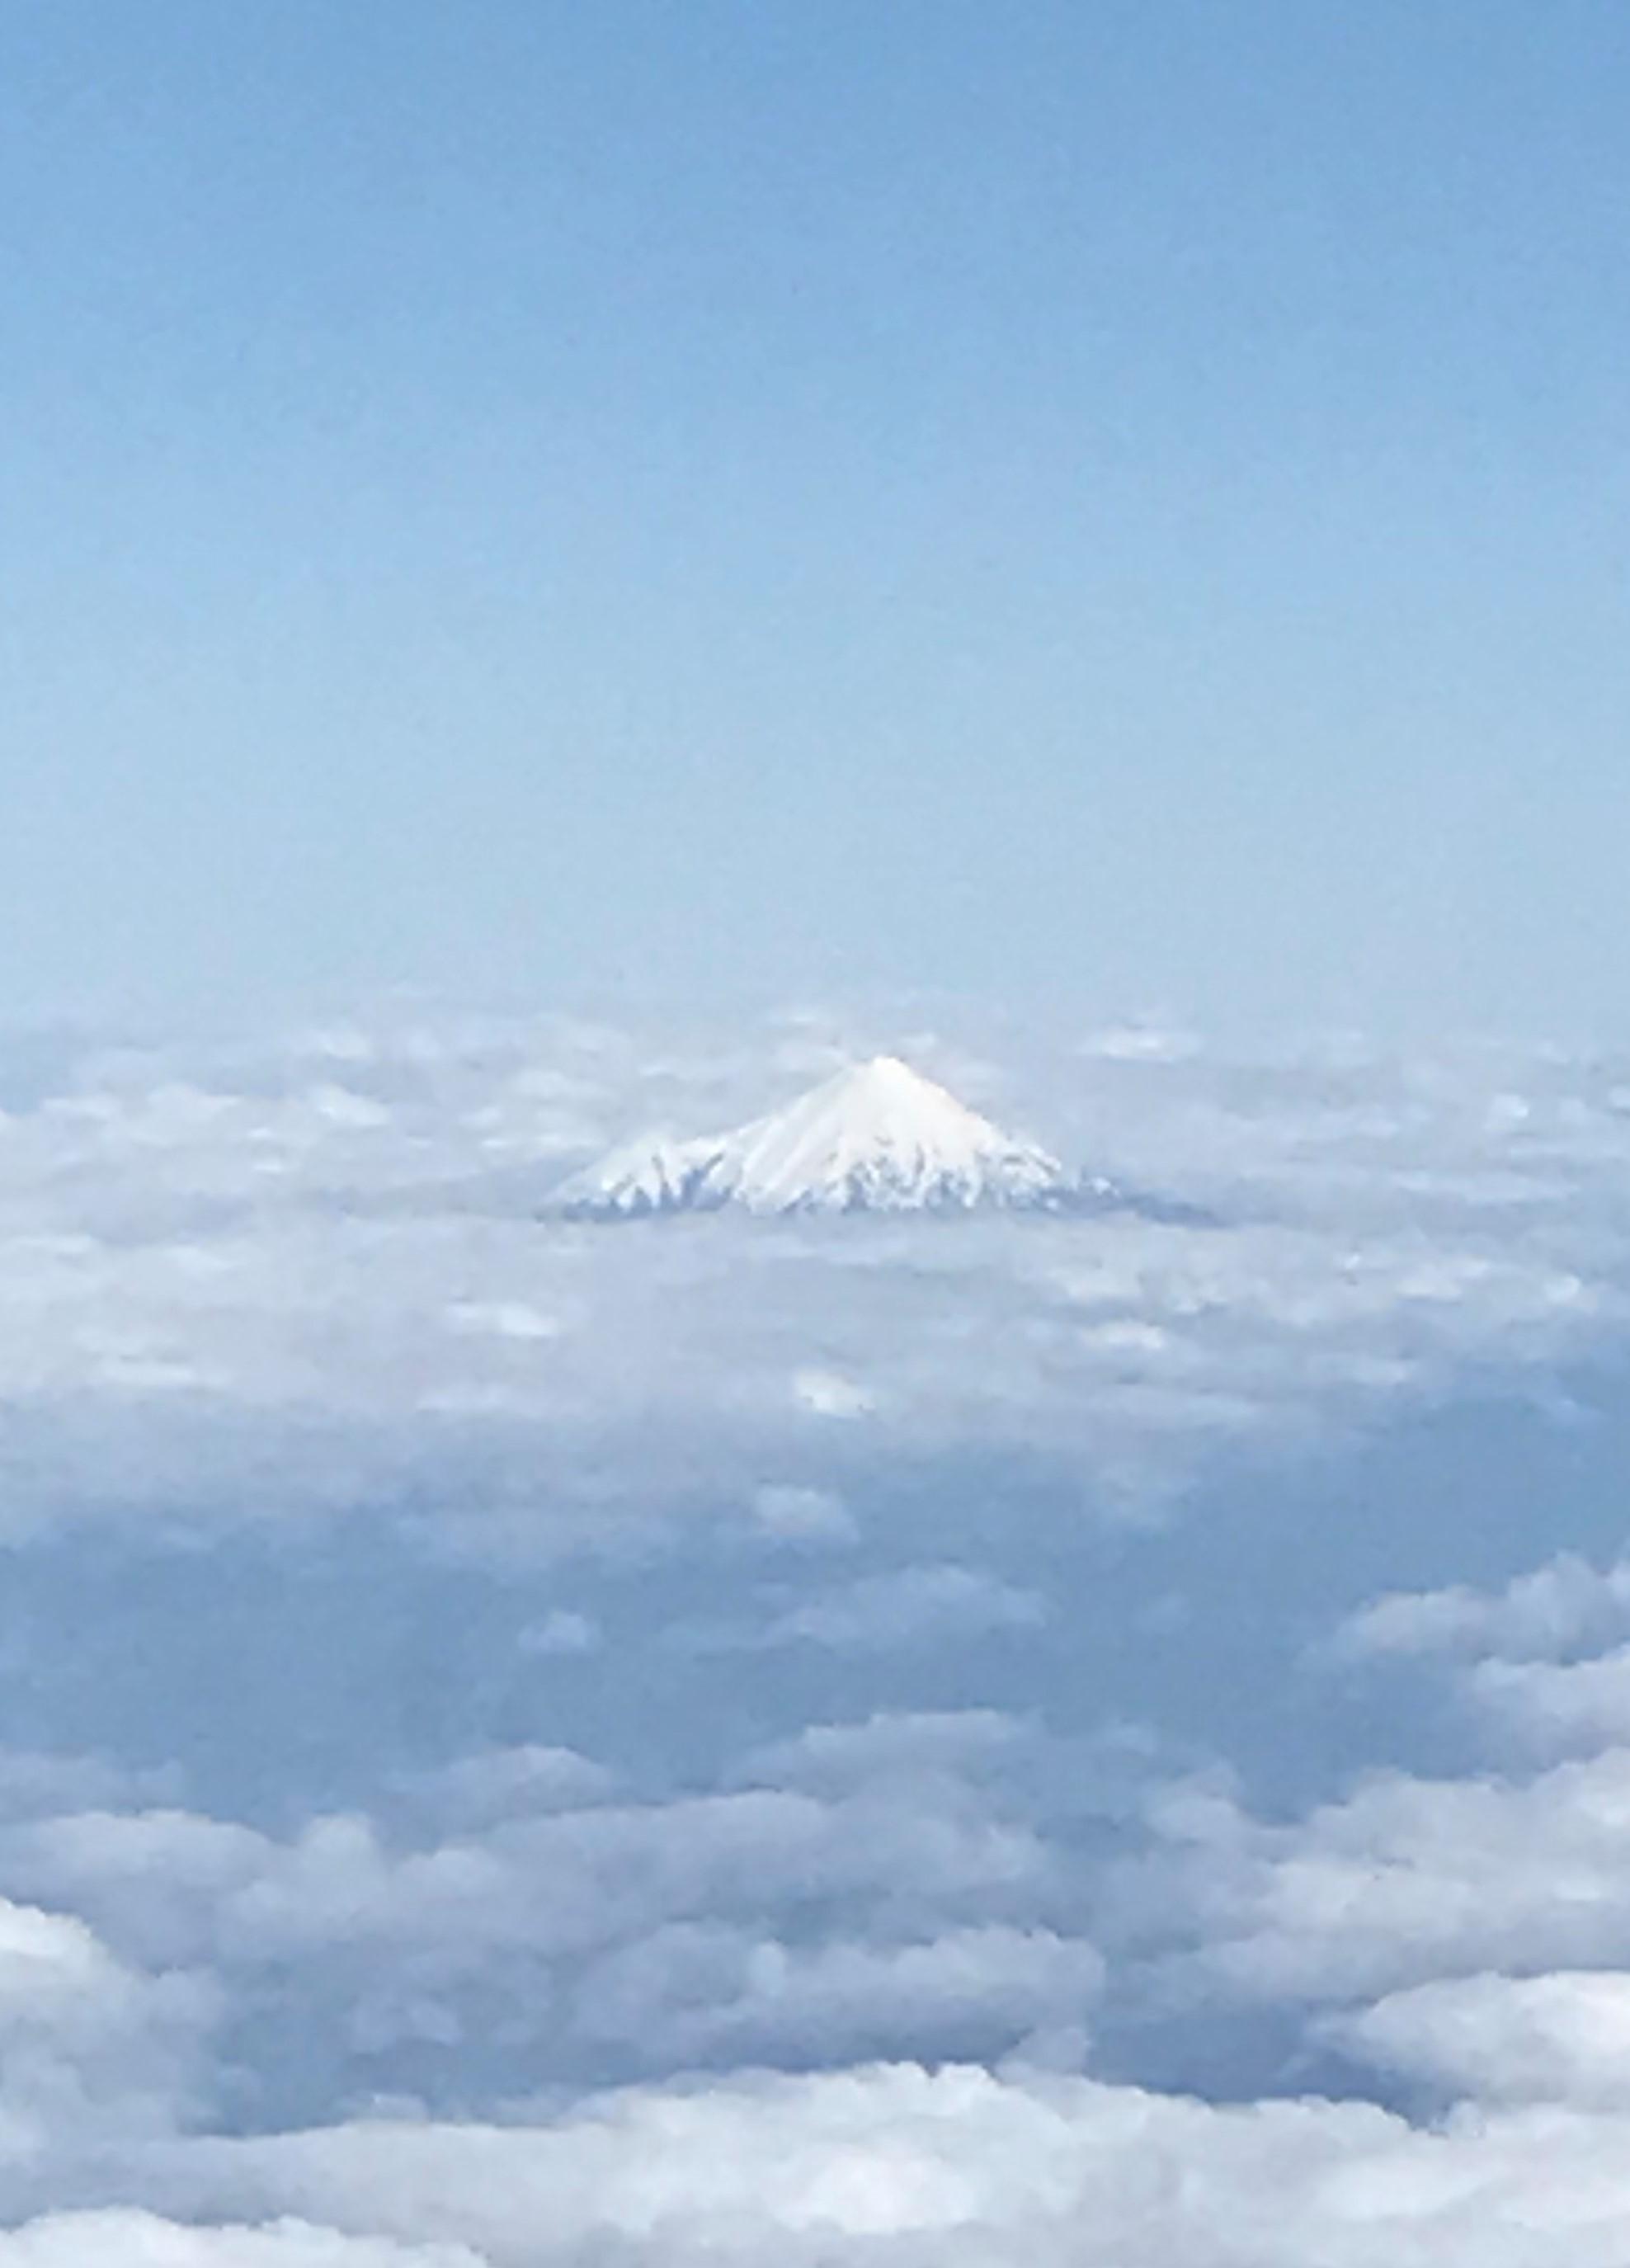 Mt Taranaki in the distance